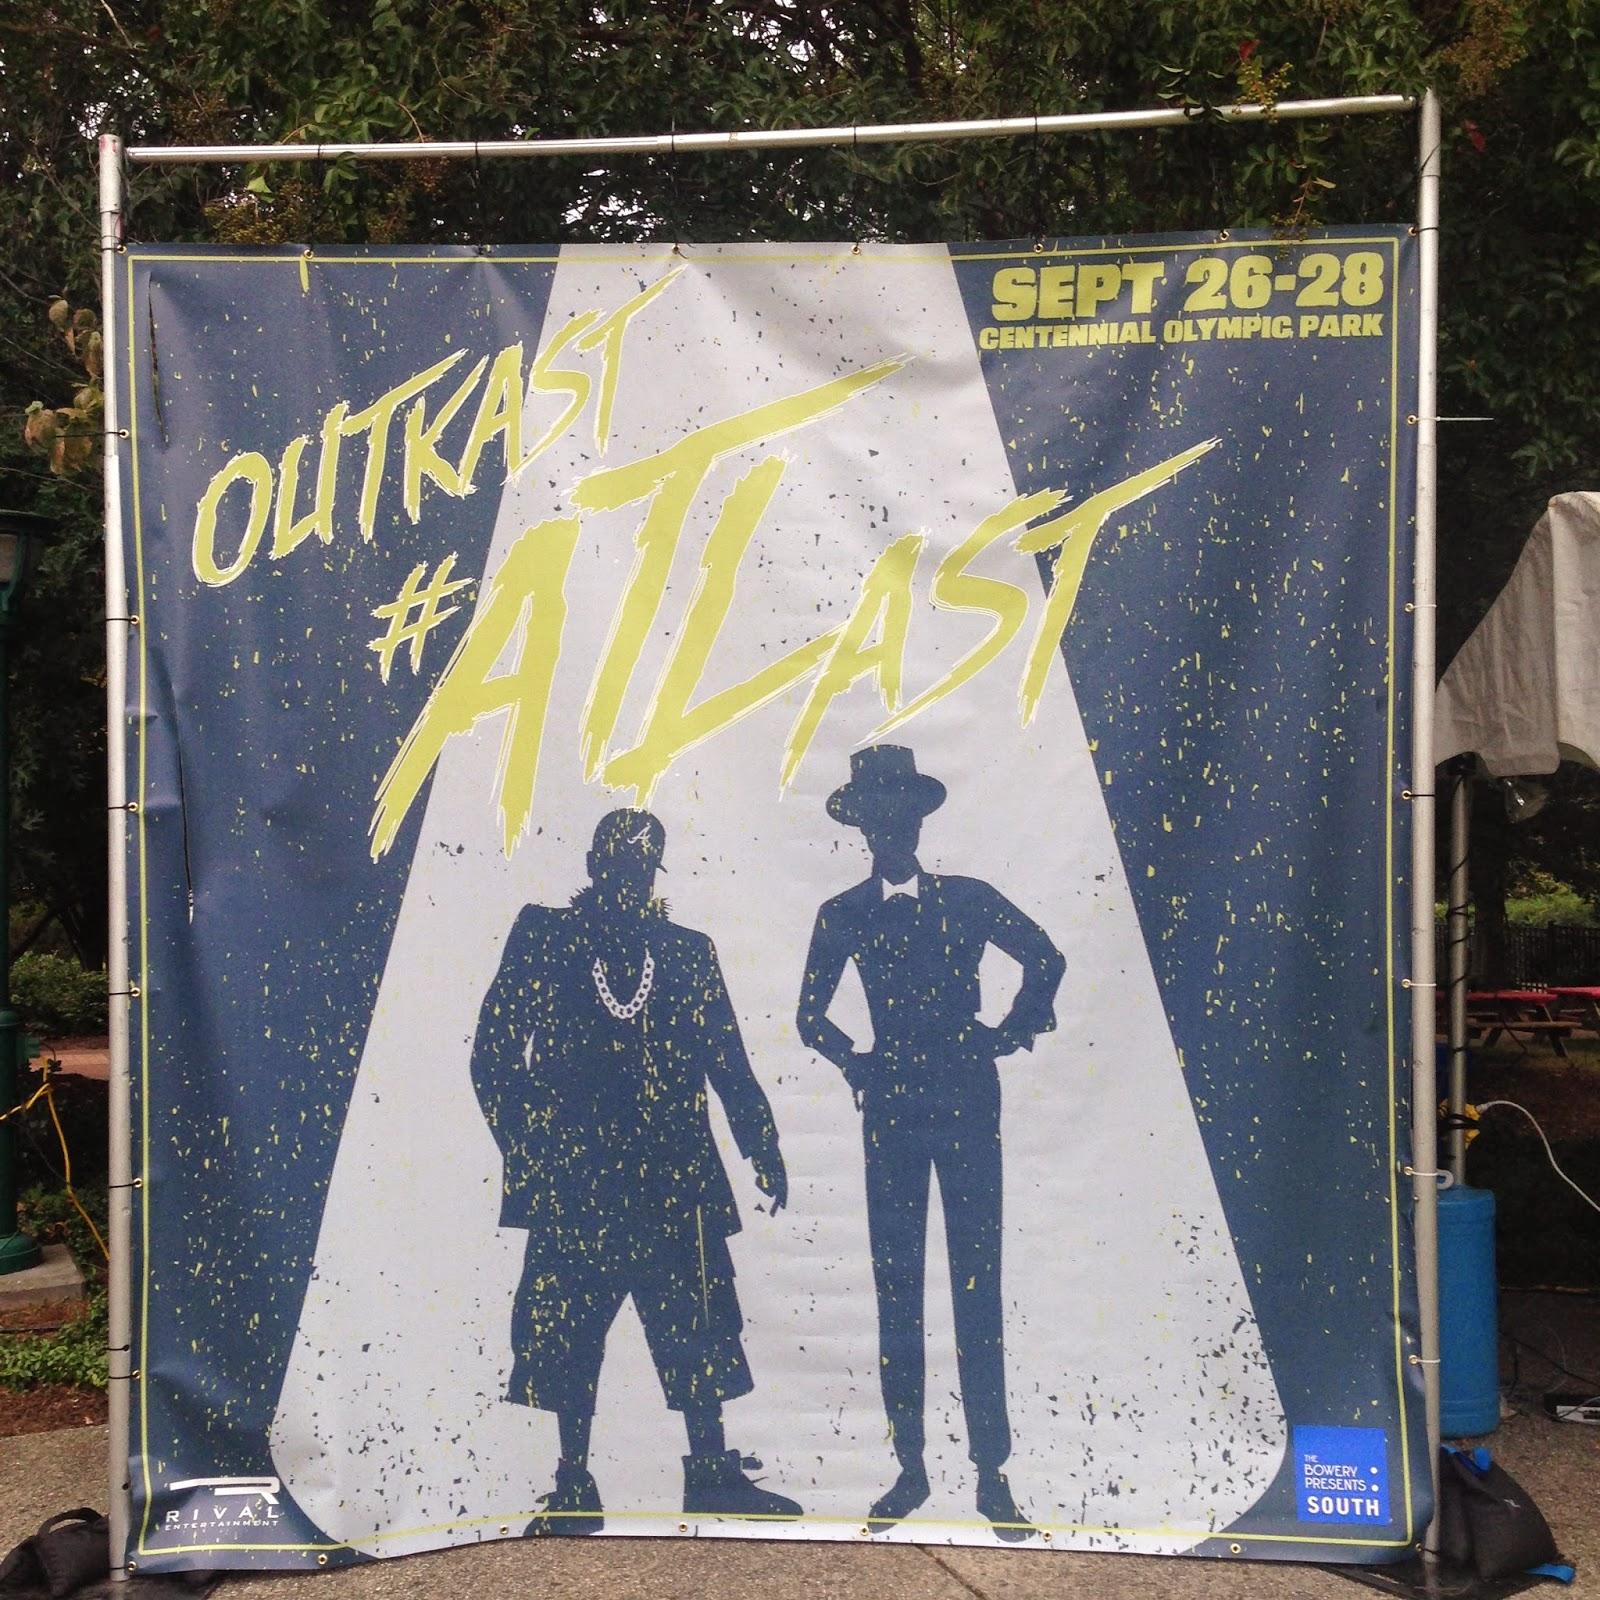 Friday night Outkast concert in Centennial Park